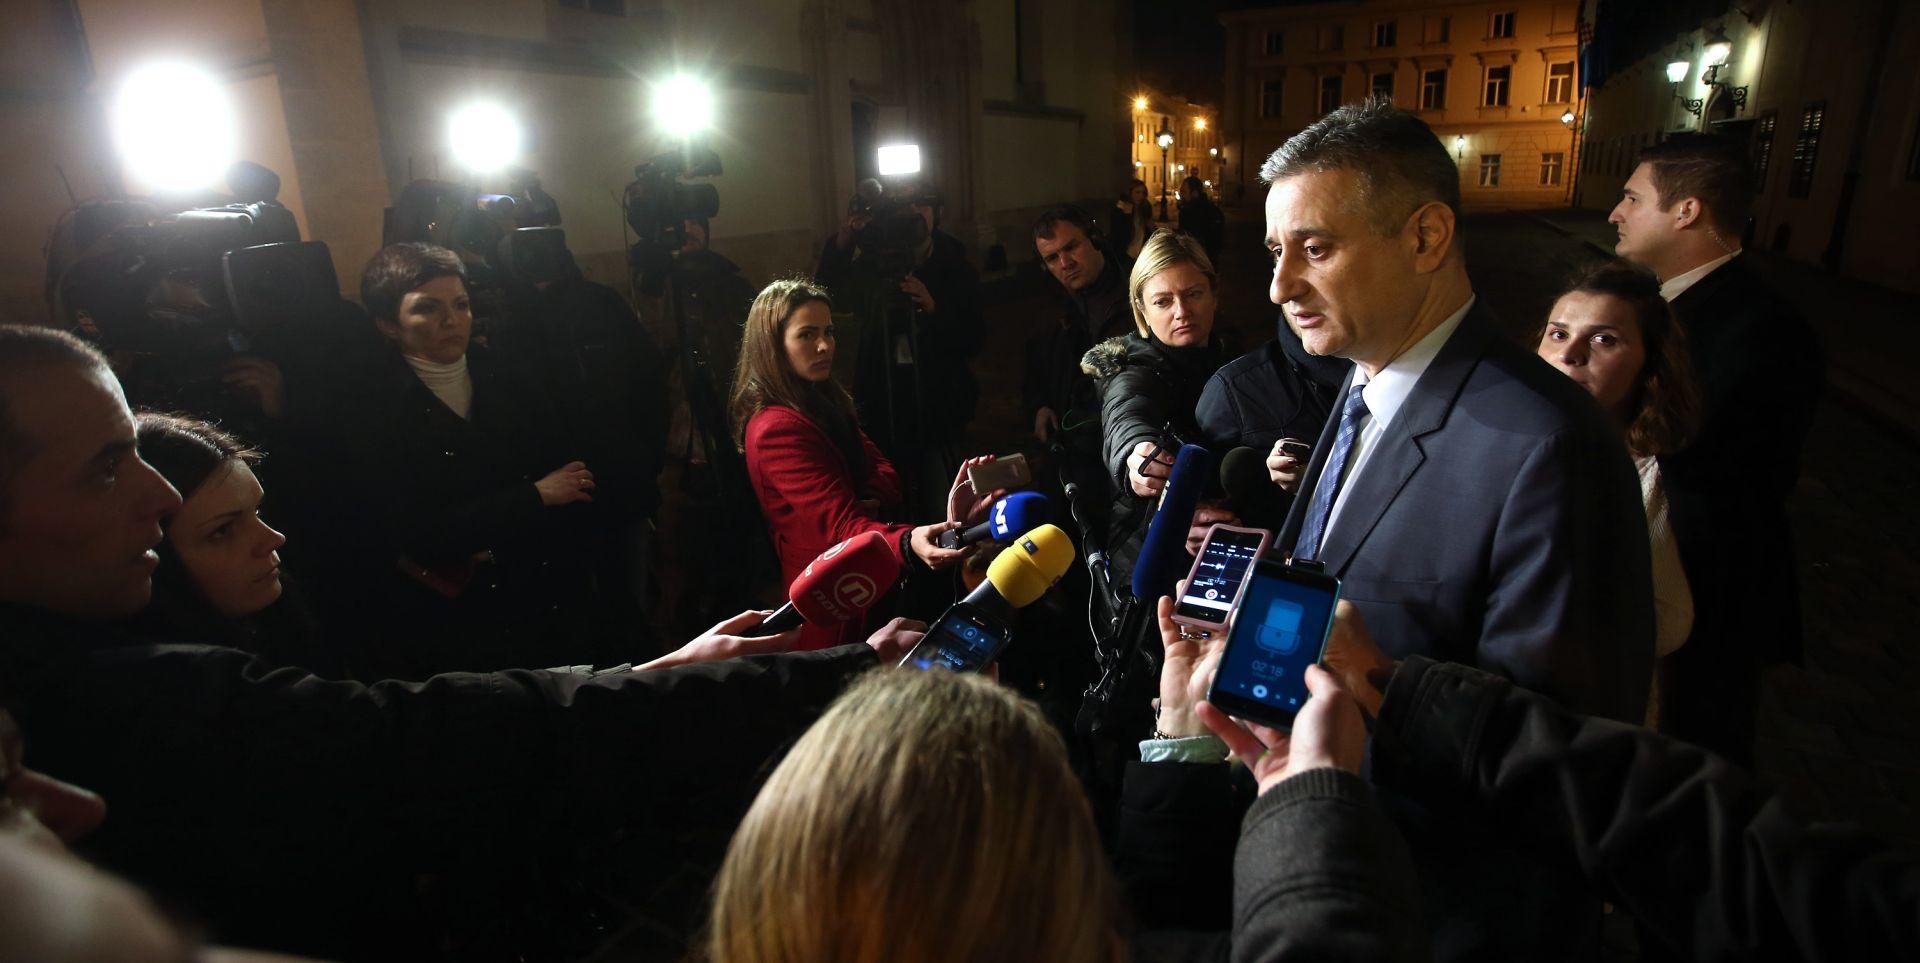 Tomislav Karamarko ispred Vlade obratio se medijima. Photo: Sanjin Strukic/PIXSELL